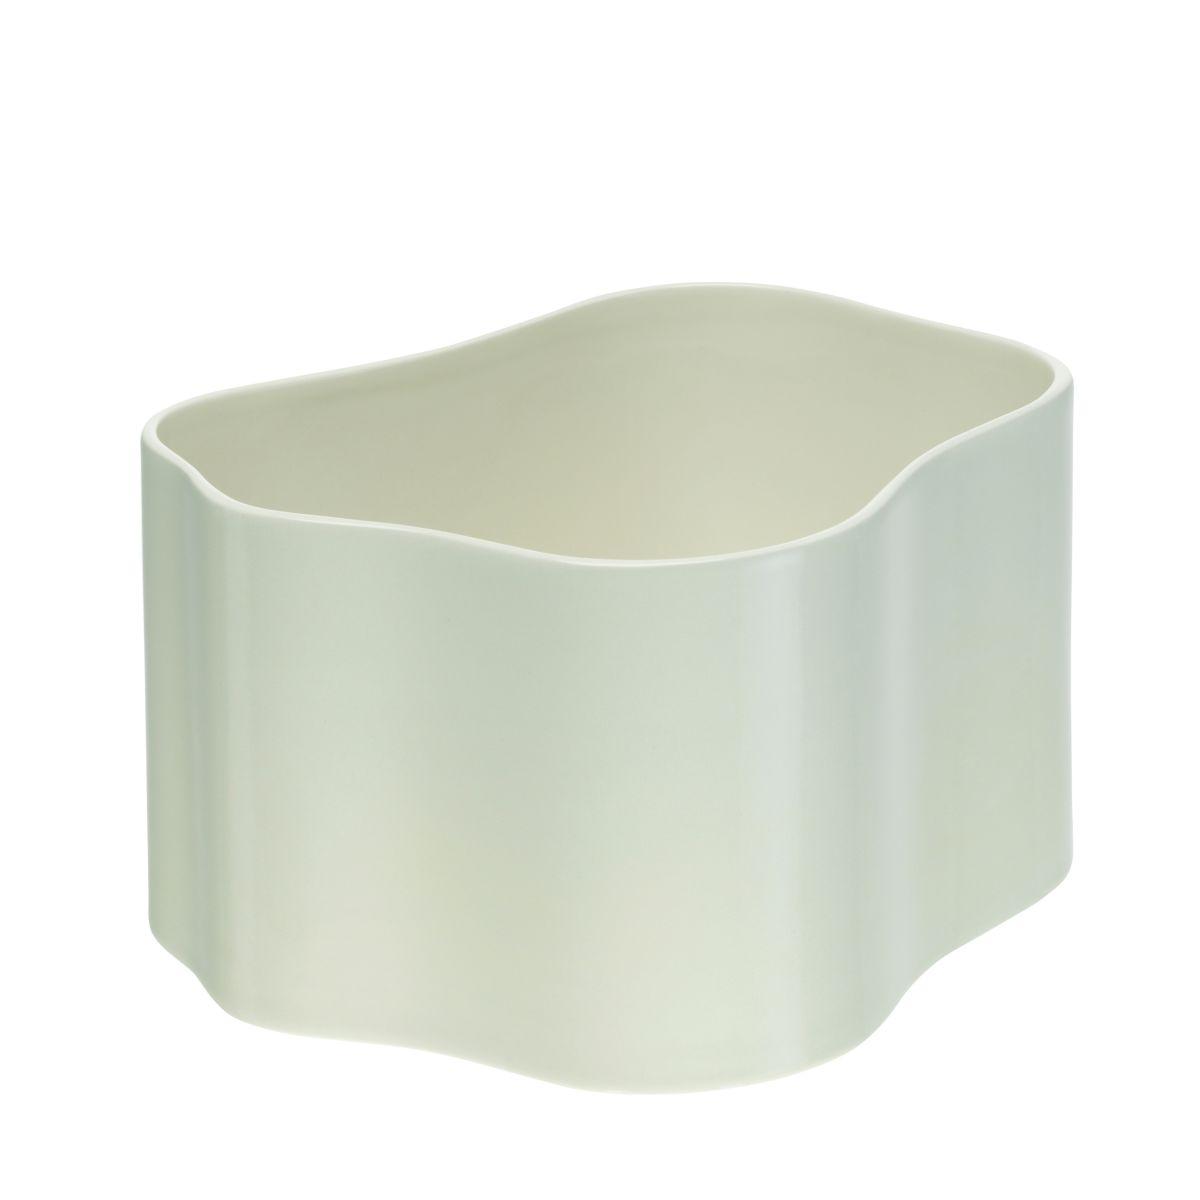 Plant-Pot-Shape-B-Size-M-White-Gloss_F